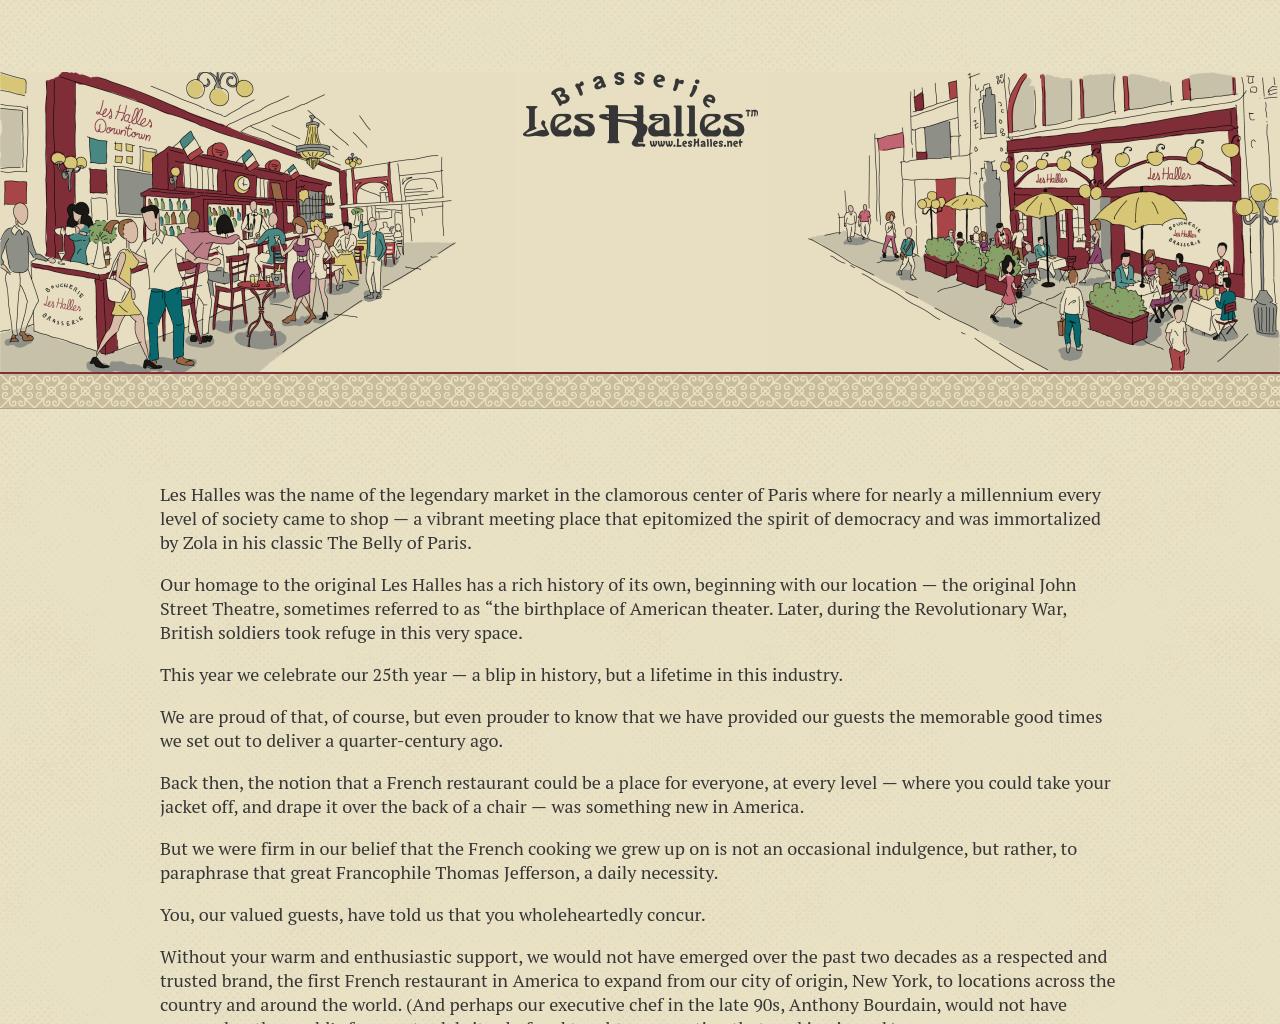 Les-Halles-Advertising-Reviews-Pricing